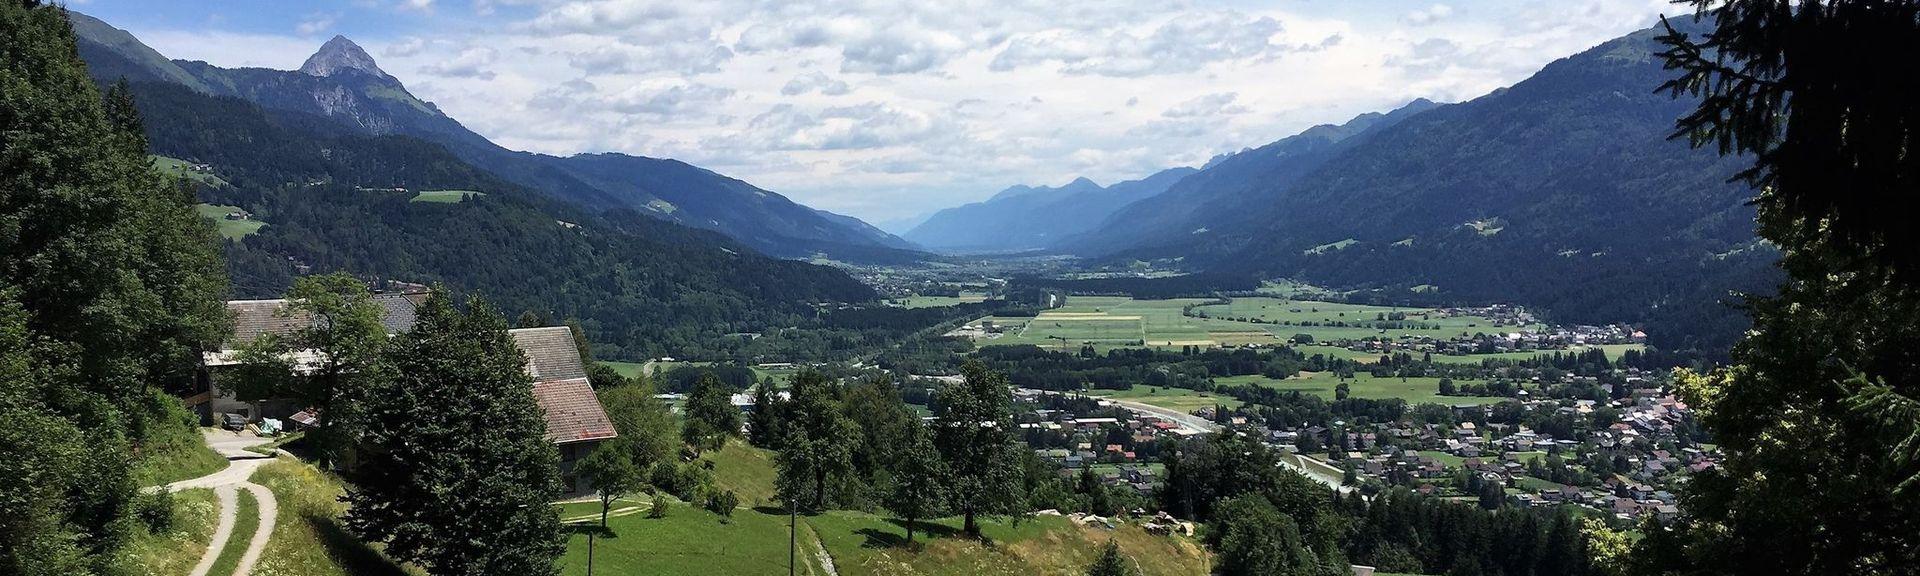 Kotschach-Mauthen, Carinthia, Austria